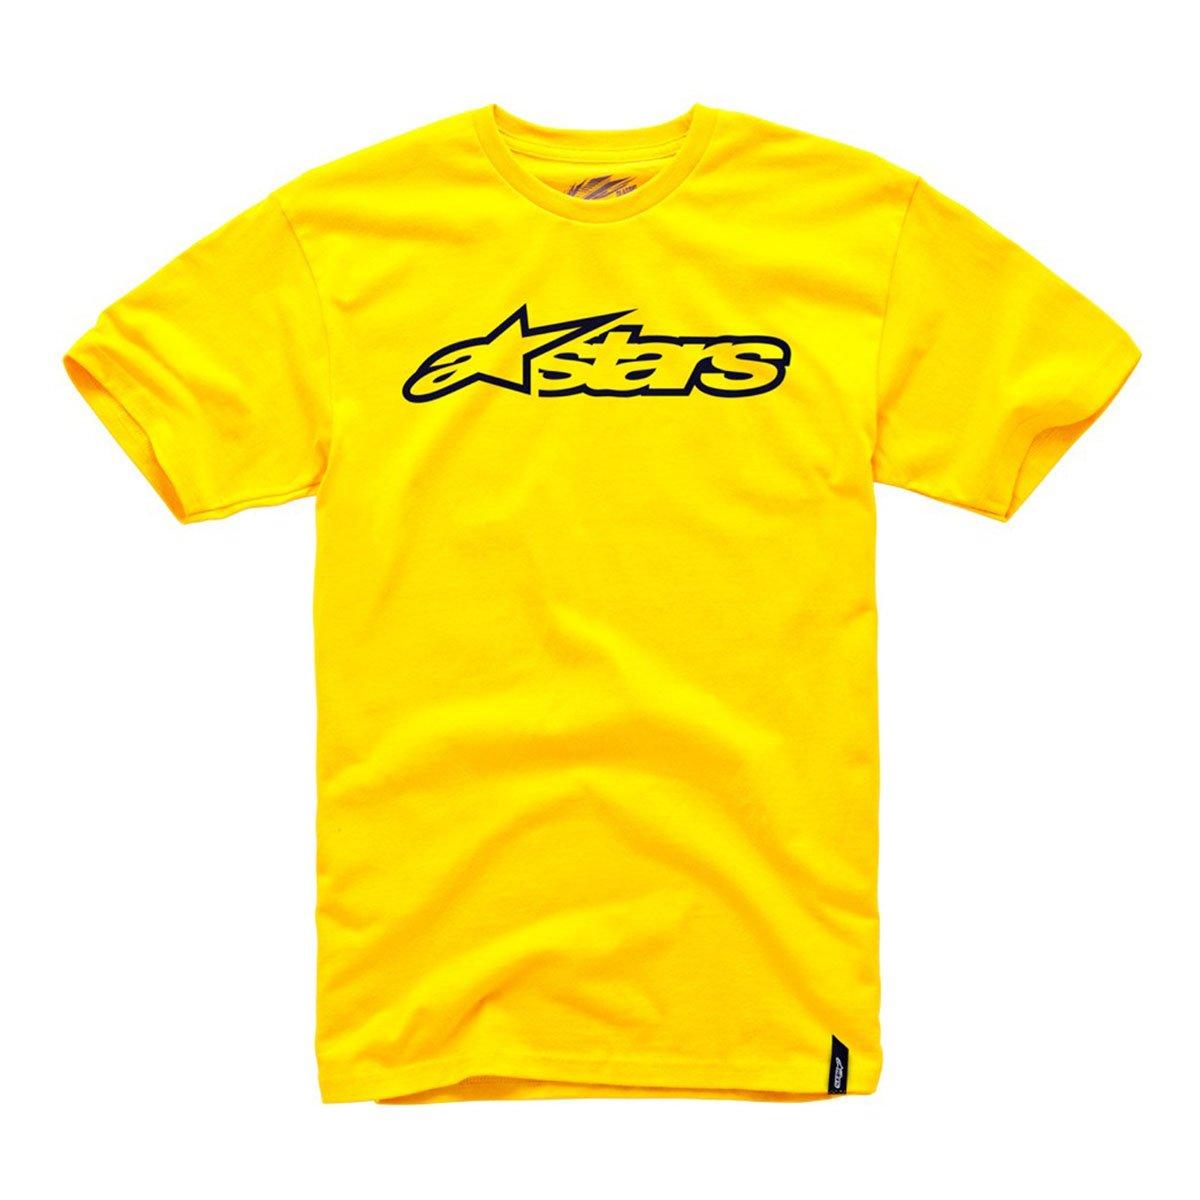 Alpinestars Men's Blaze Classic Short-Sleeve Shirt, Gold/Black, Large